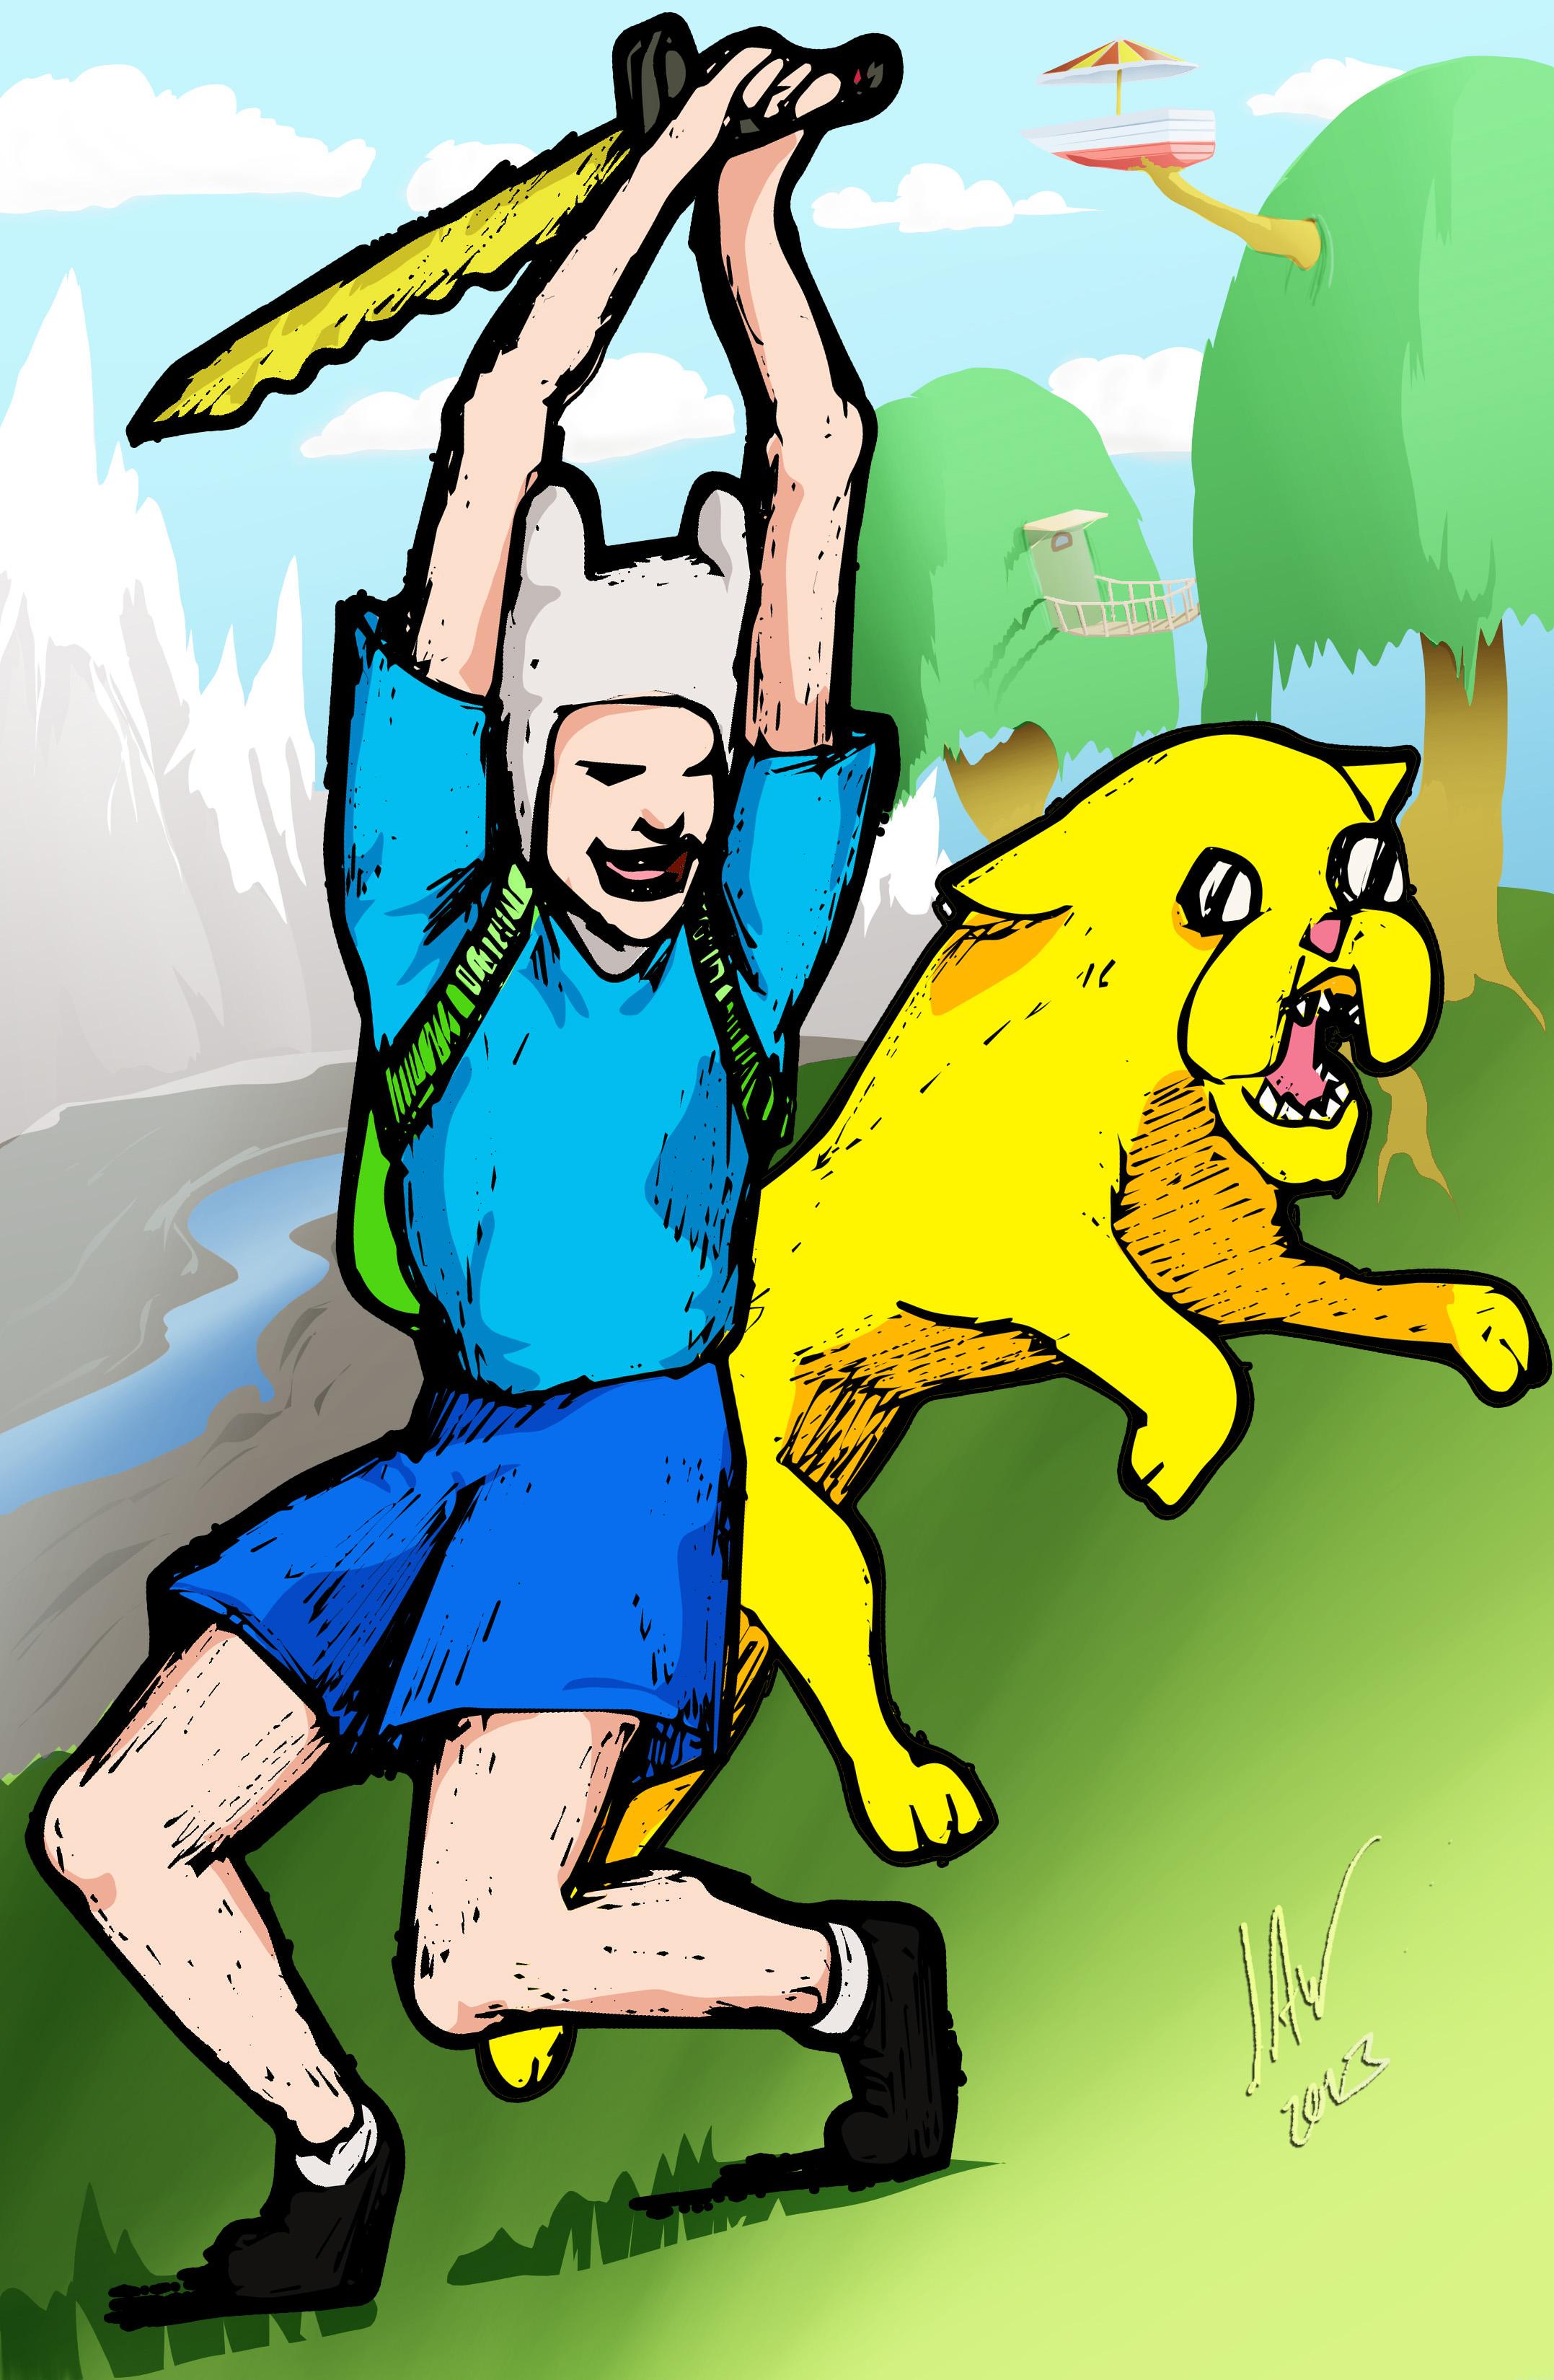 Adventure Time-Finn and Jake Manga Style 11x17.jpg